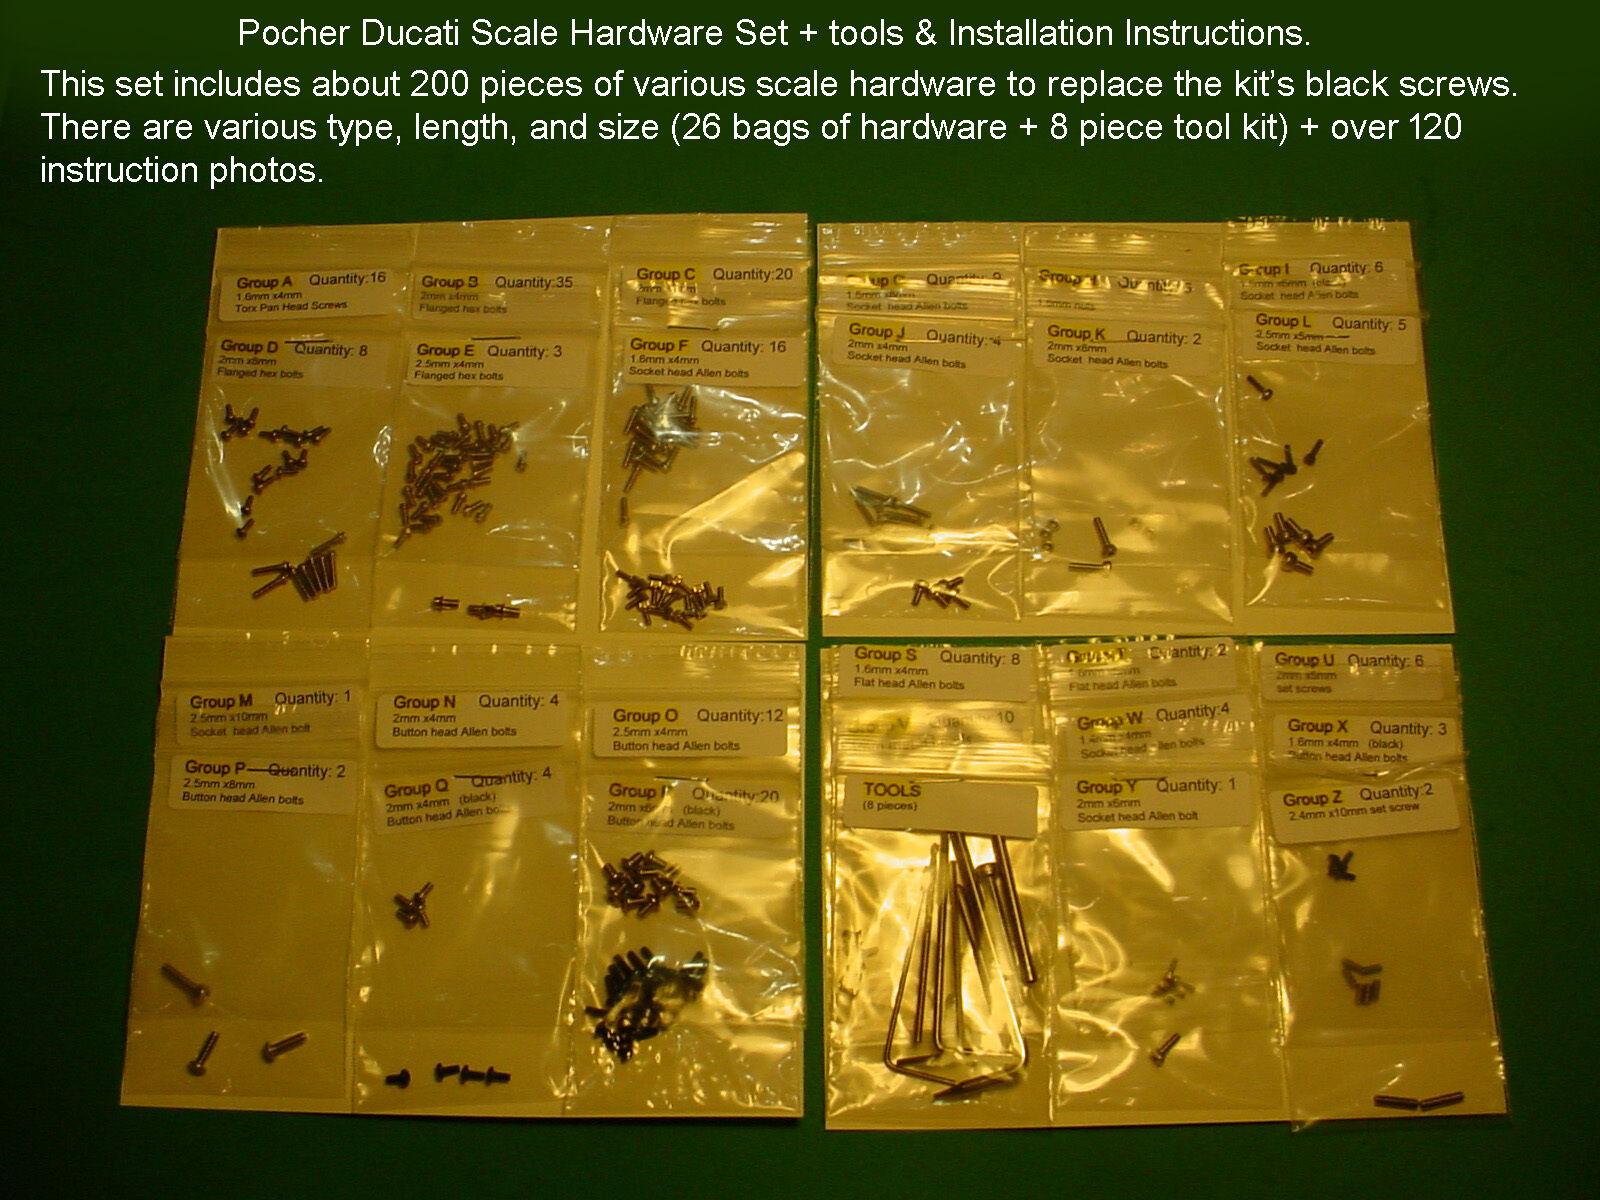 POCHER DUCATI 1299 PANIGALE S SCALE HARDWARE SET + TOOL KIT + INSTRUCTION PHOTOS